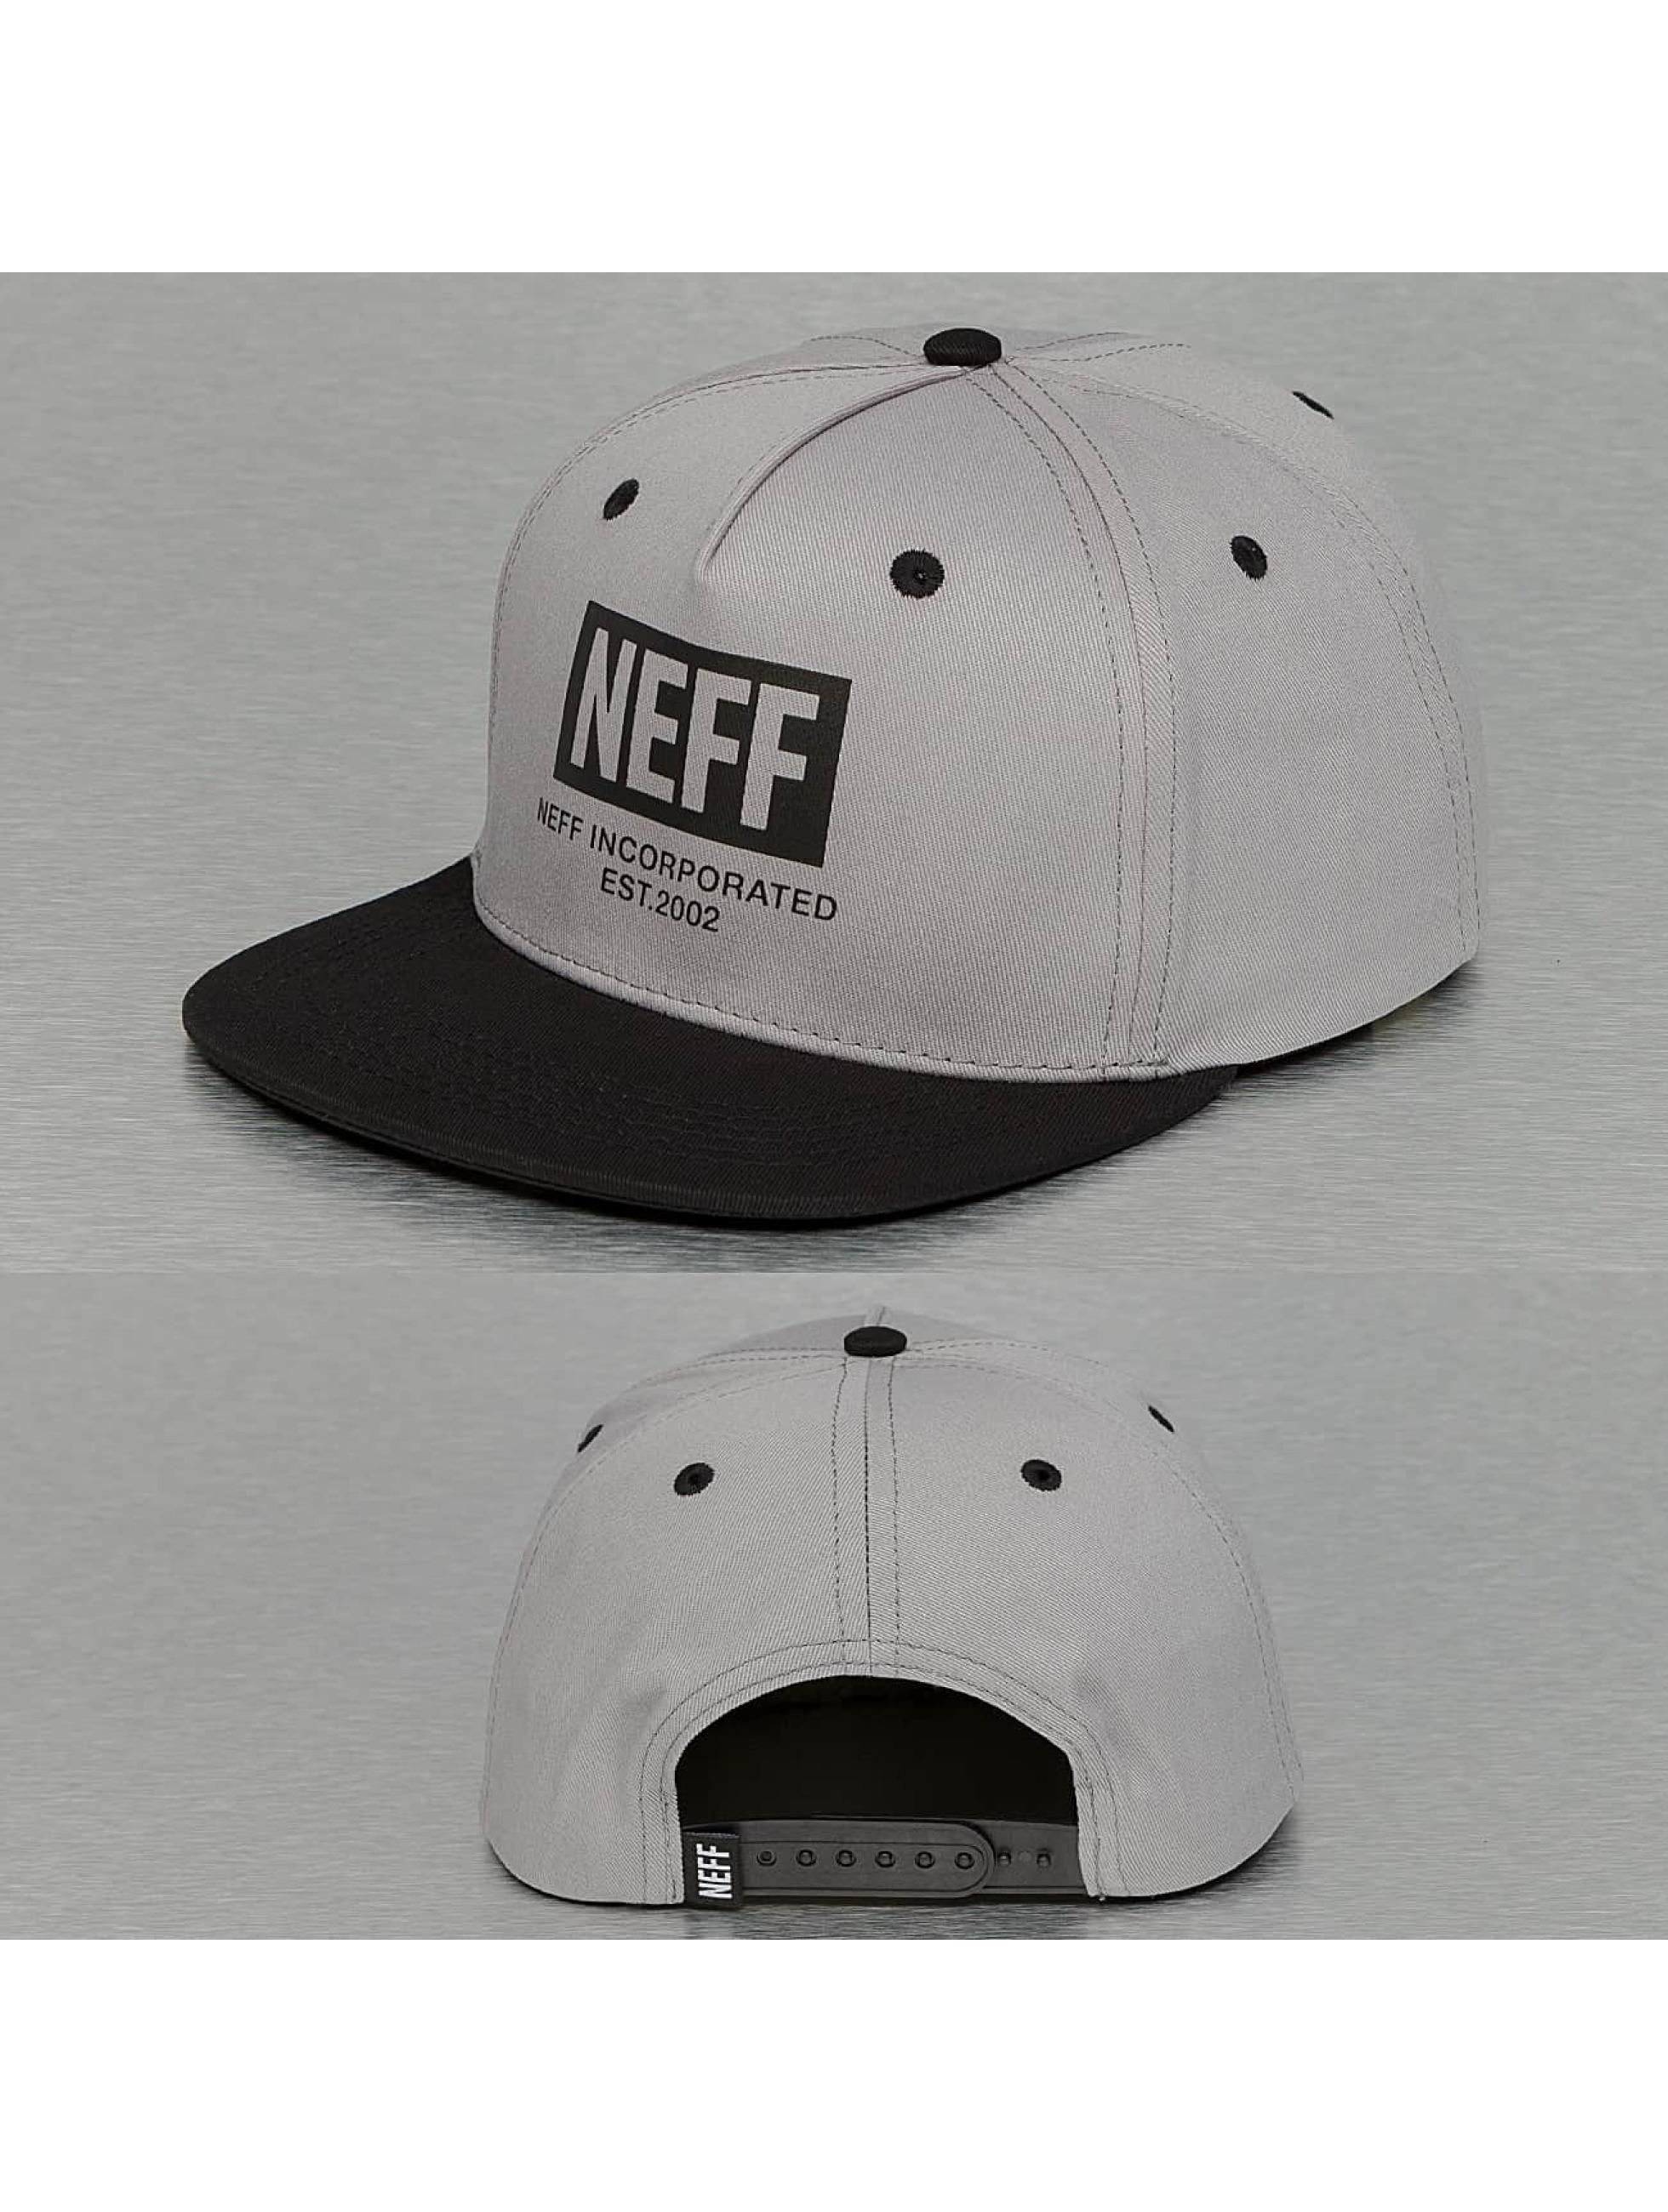 NEFF Männer,Frauen Snapback Cap New World in grau